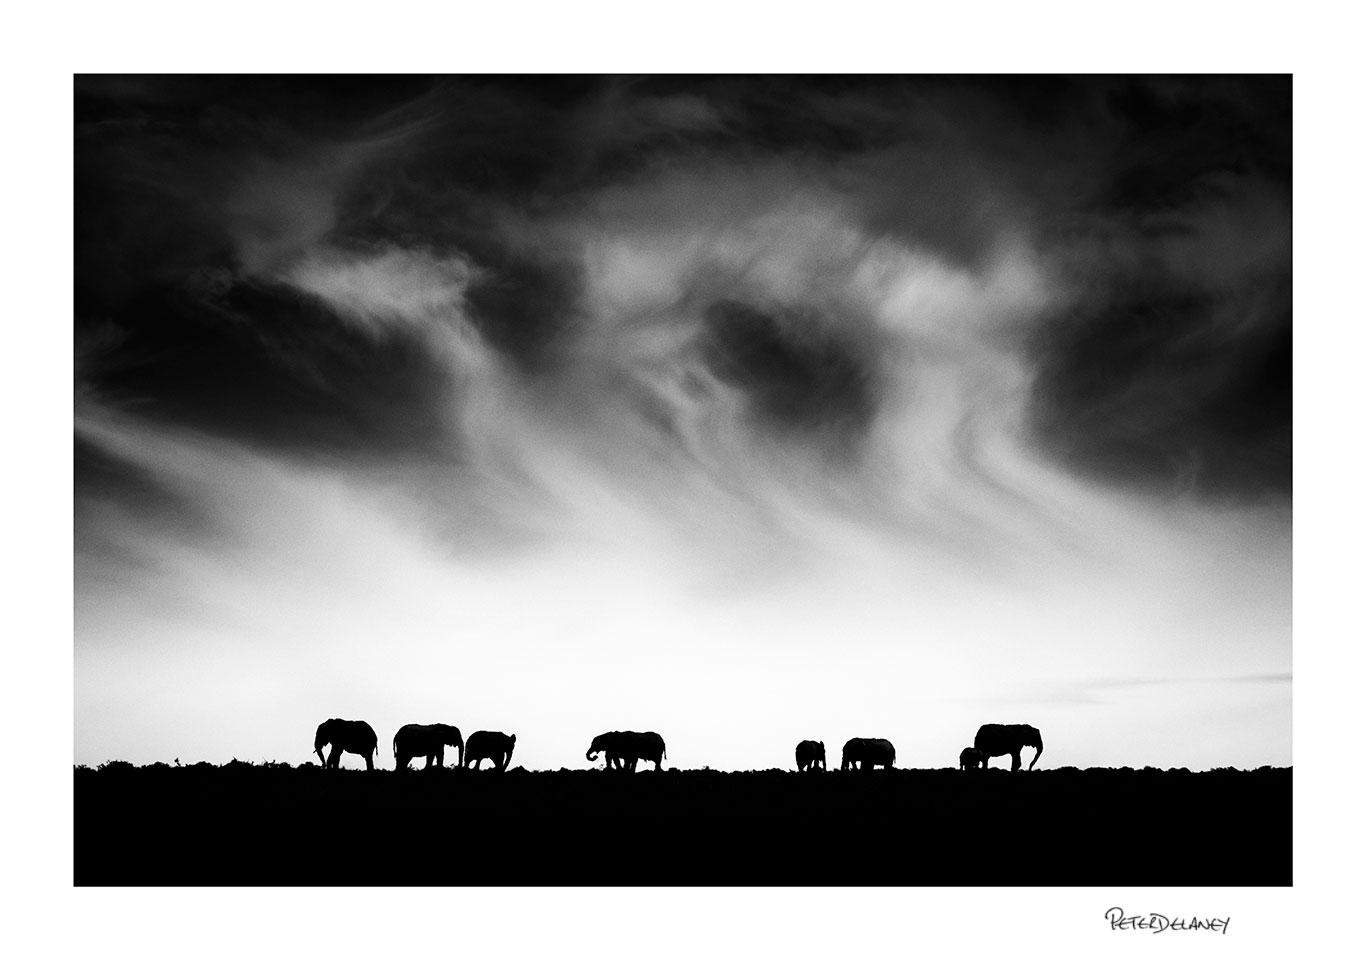 no-12-Silhoette-Elephants-clouds.jpg